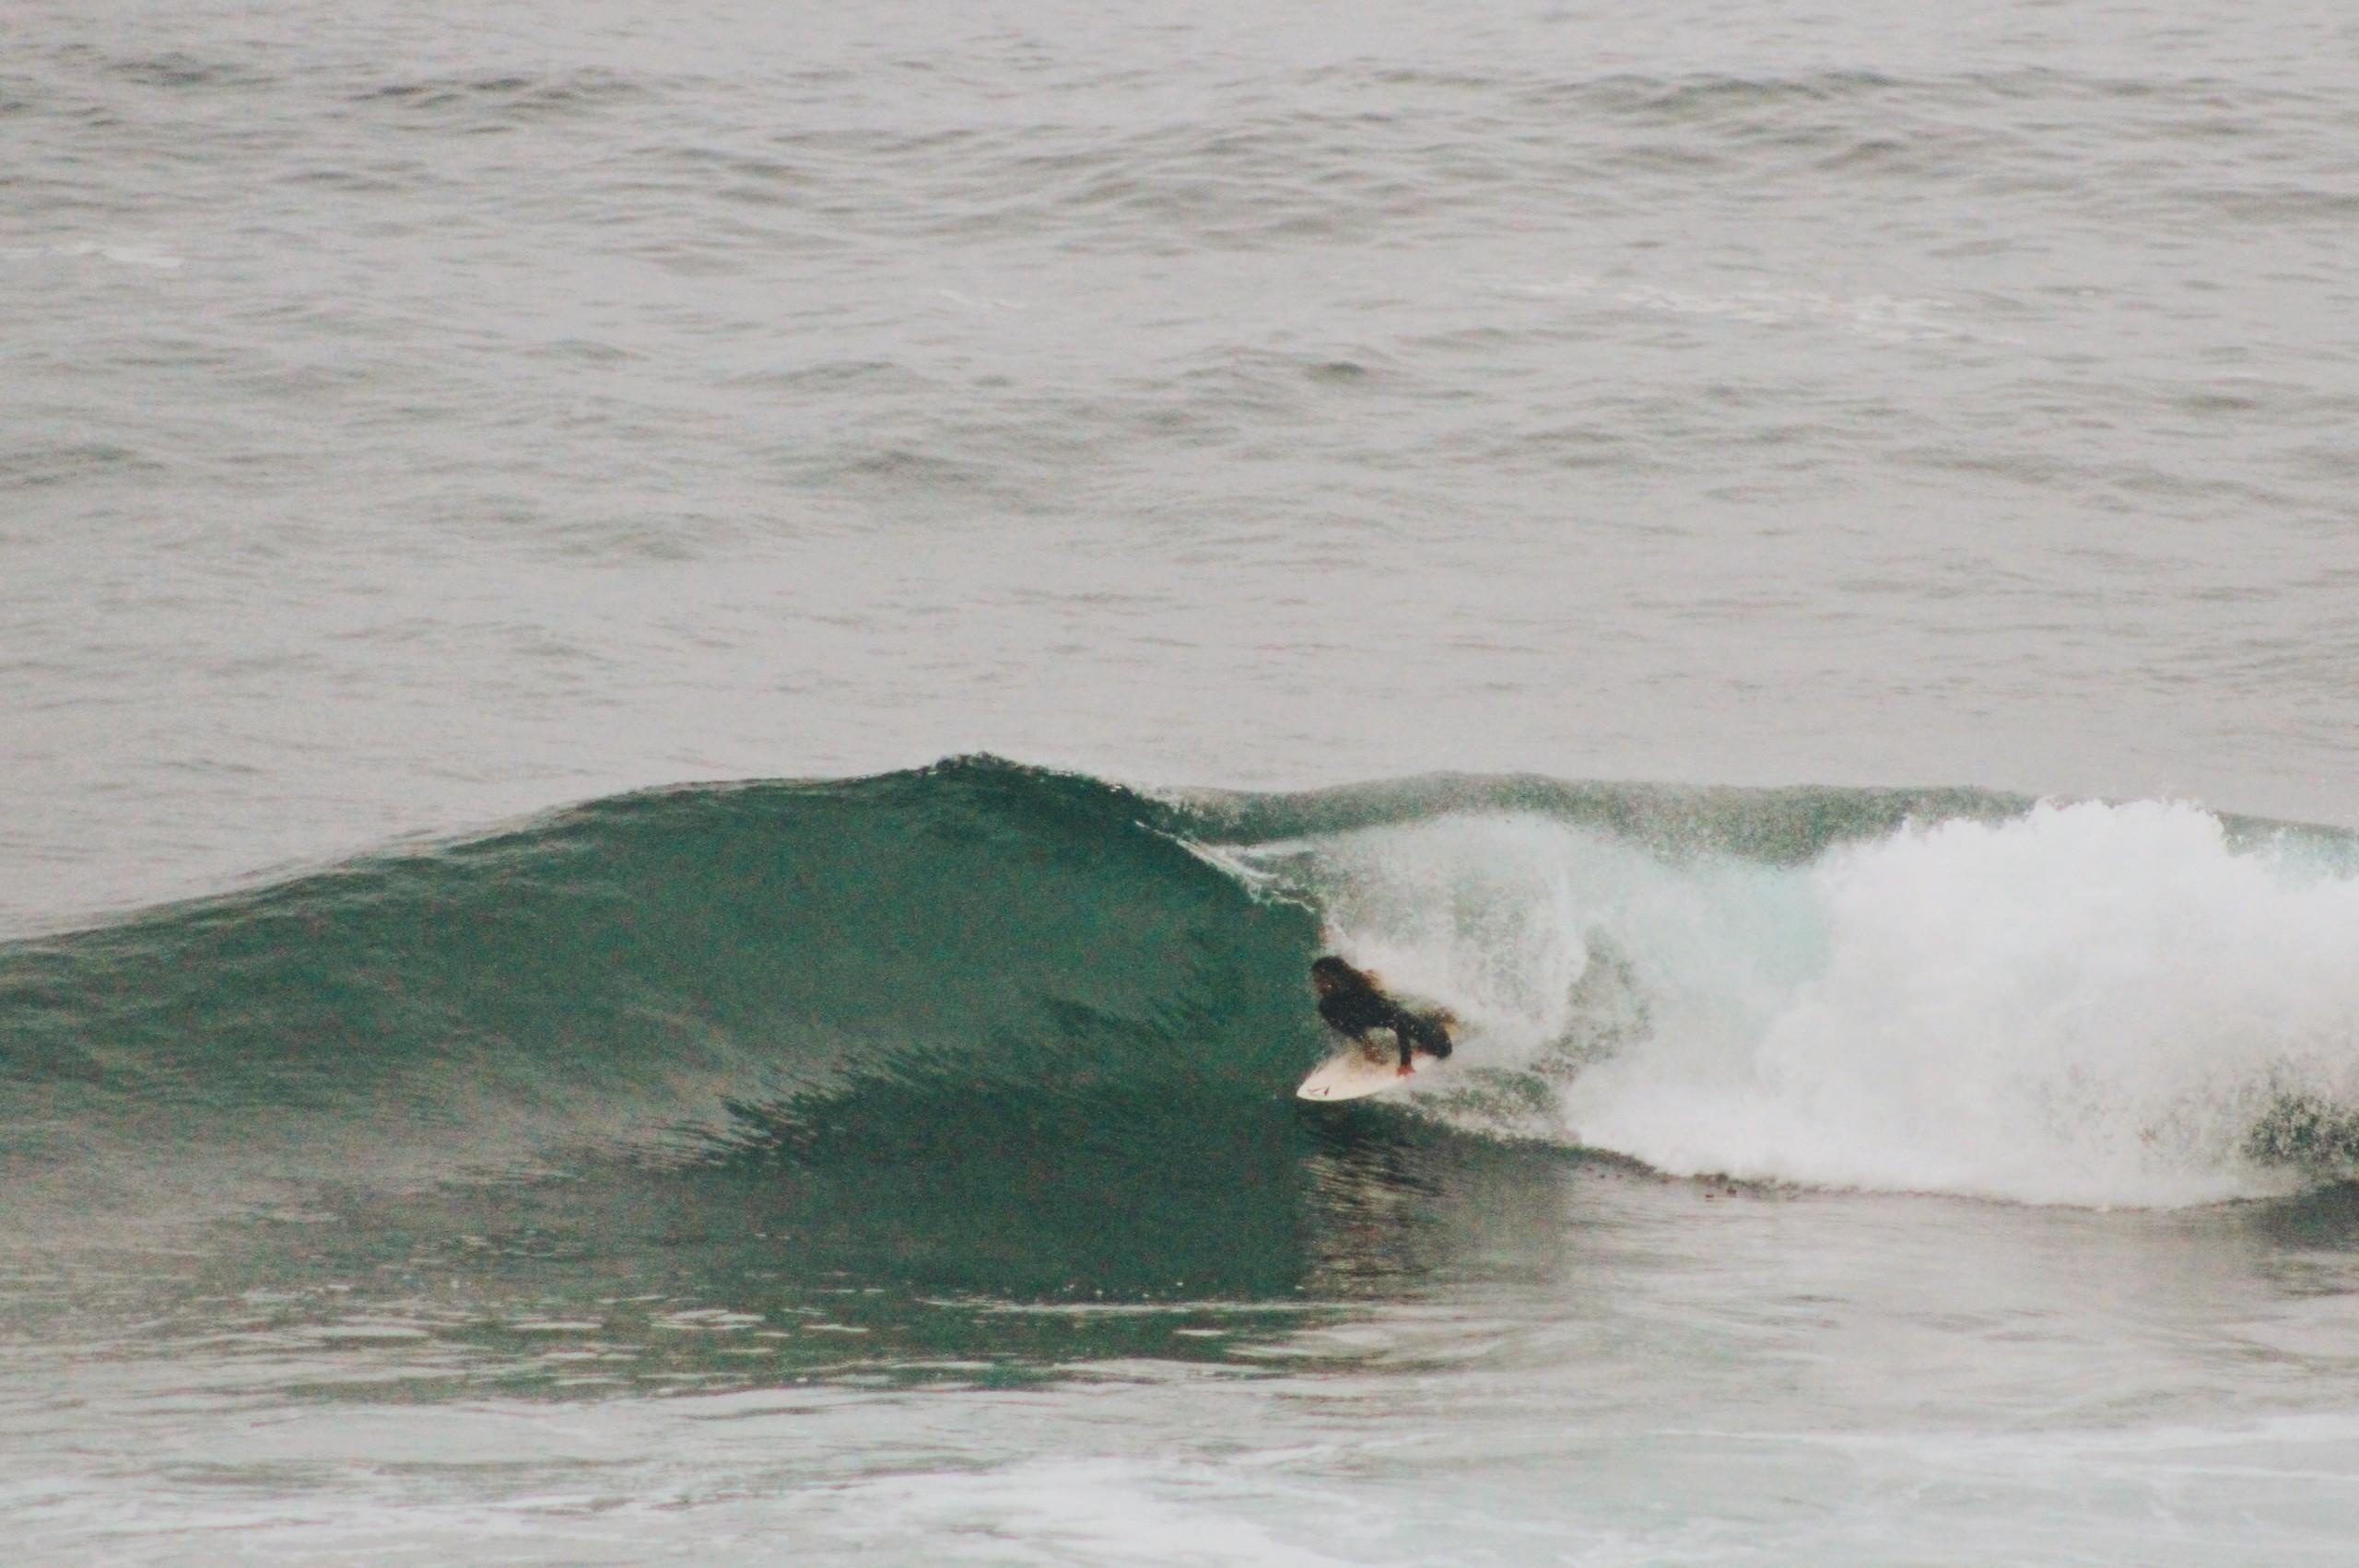 surf maroc swell slab